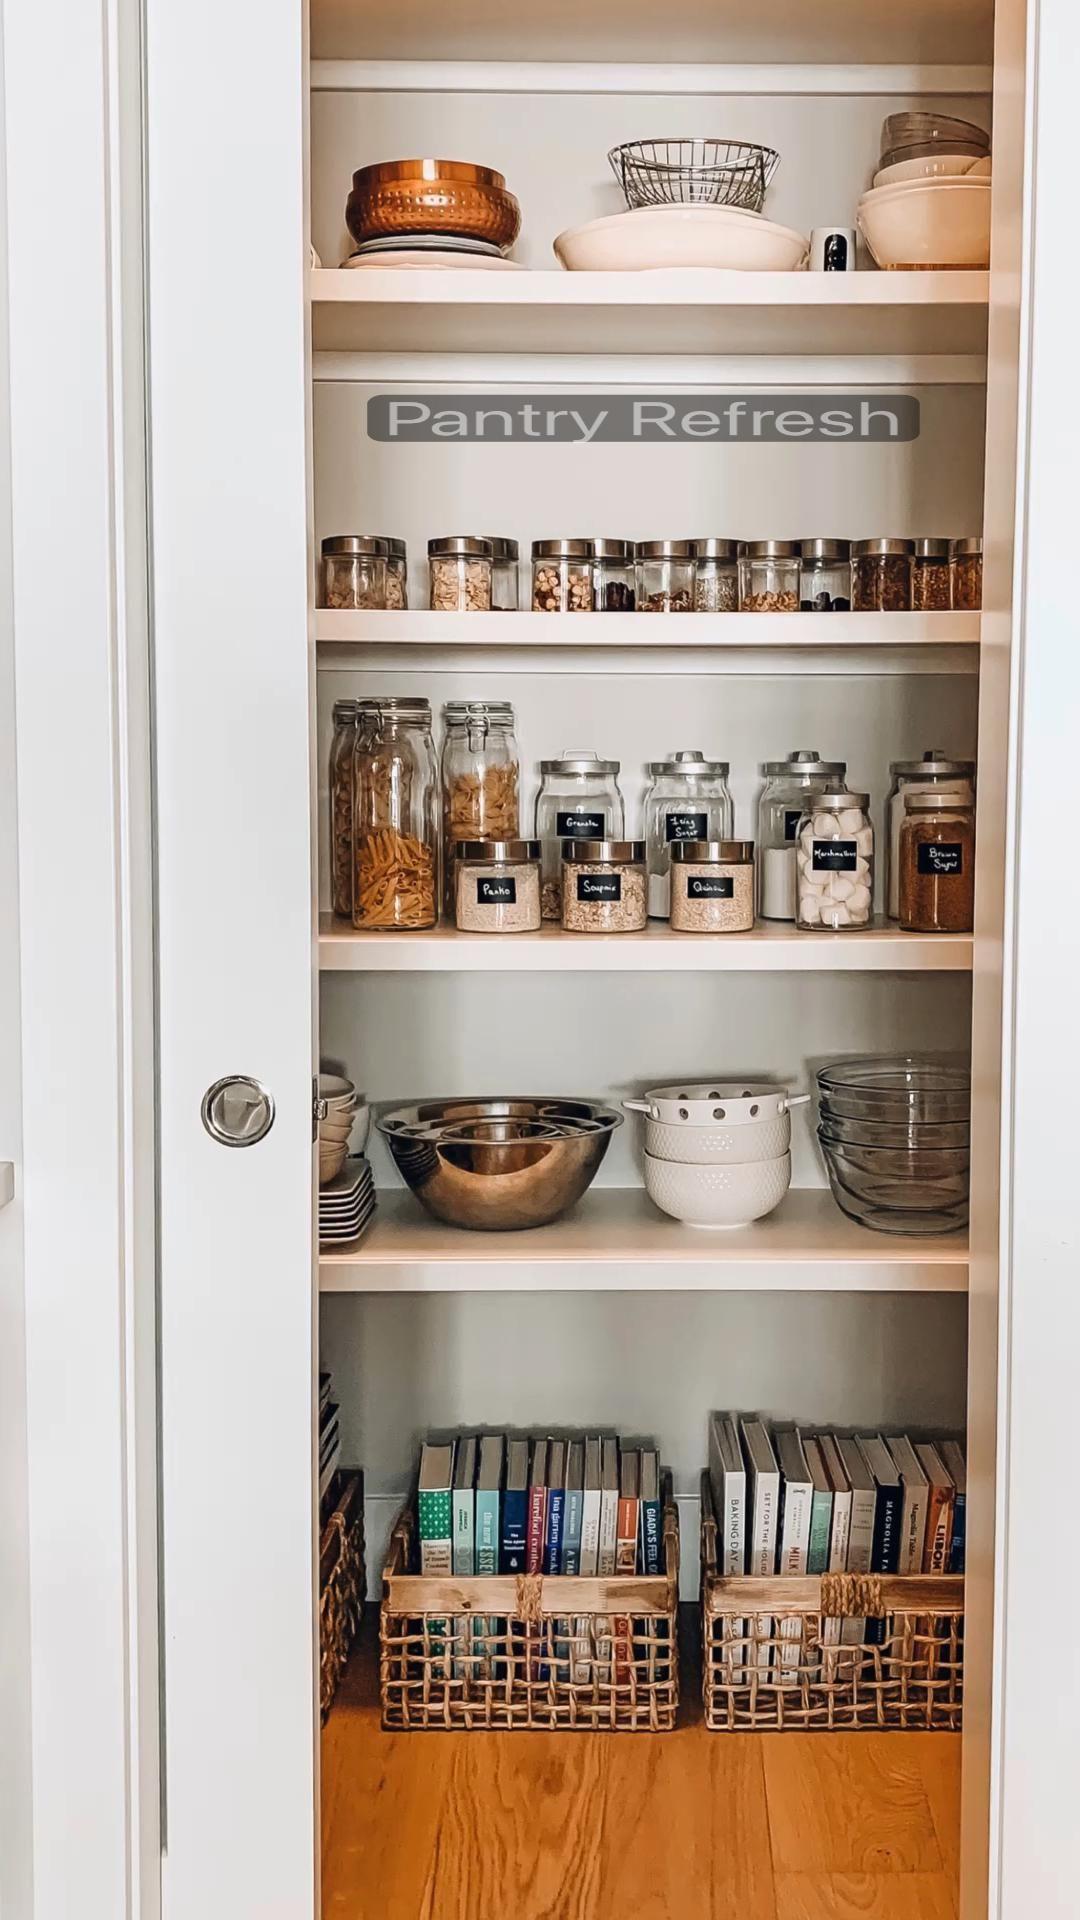 30 Kitchen Island Ideas to add that perfect blend of drama & design